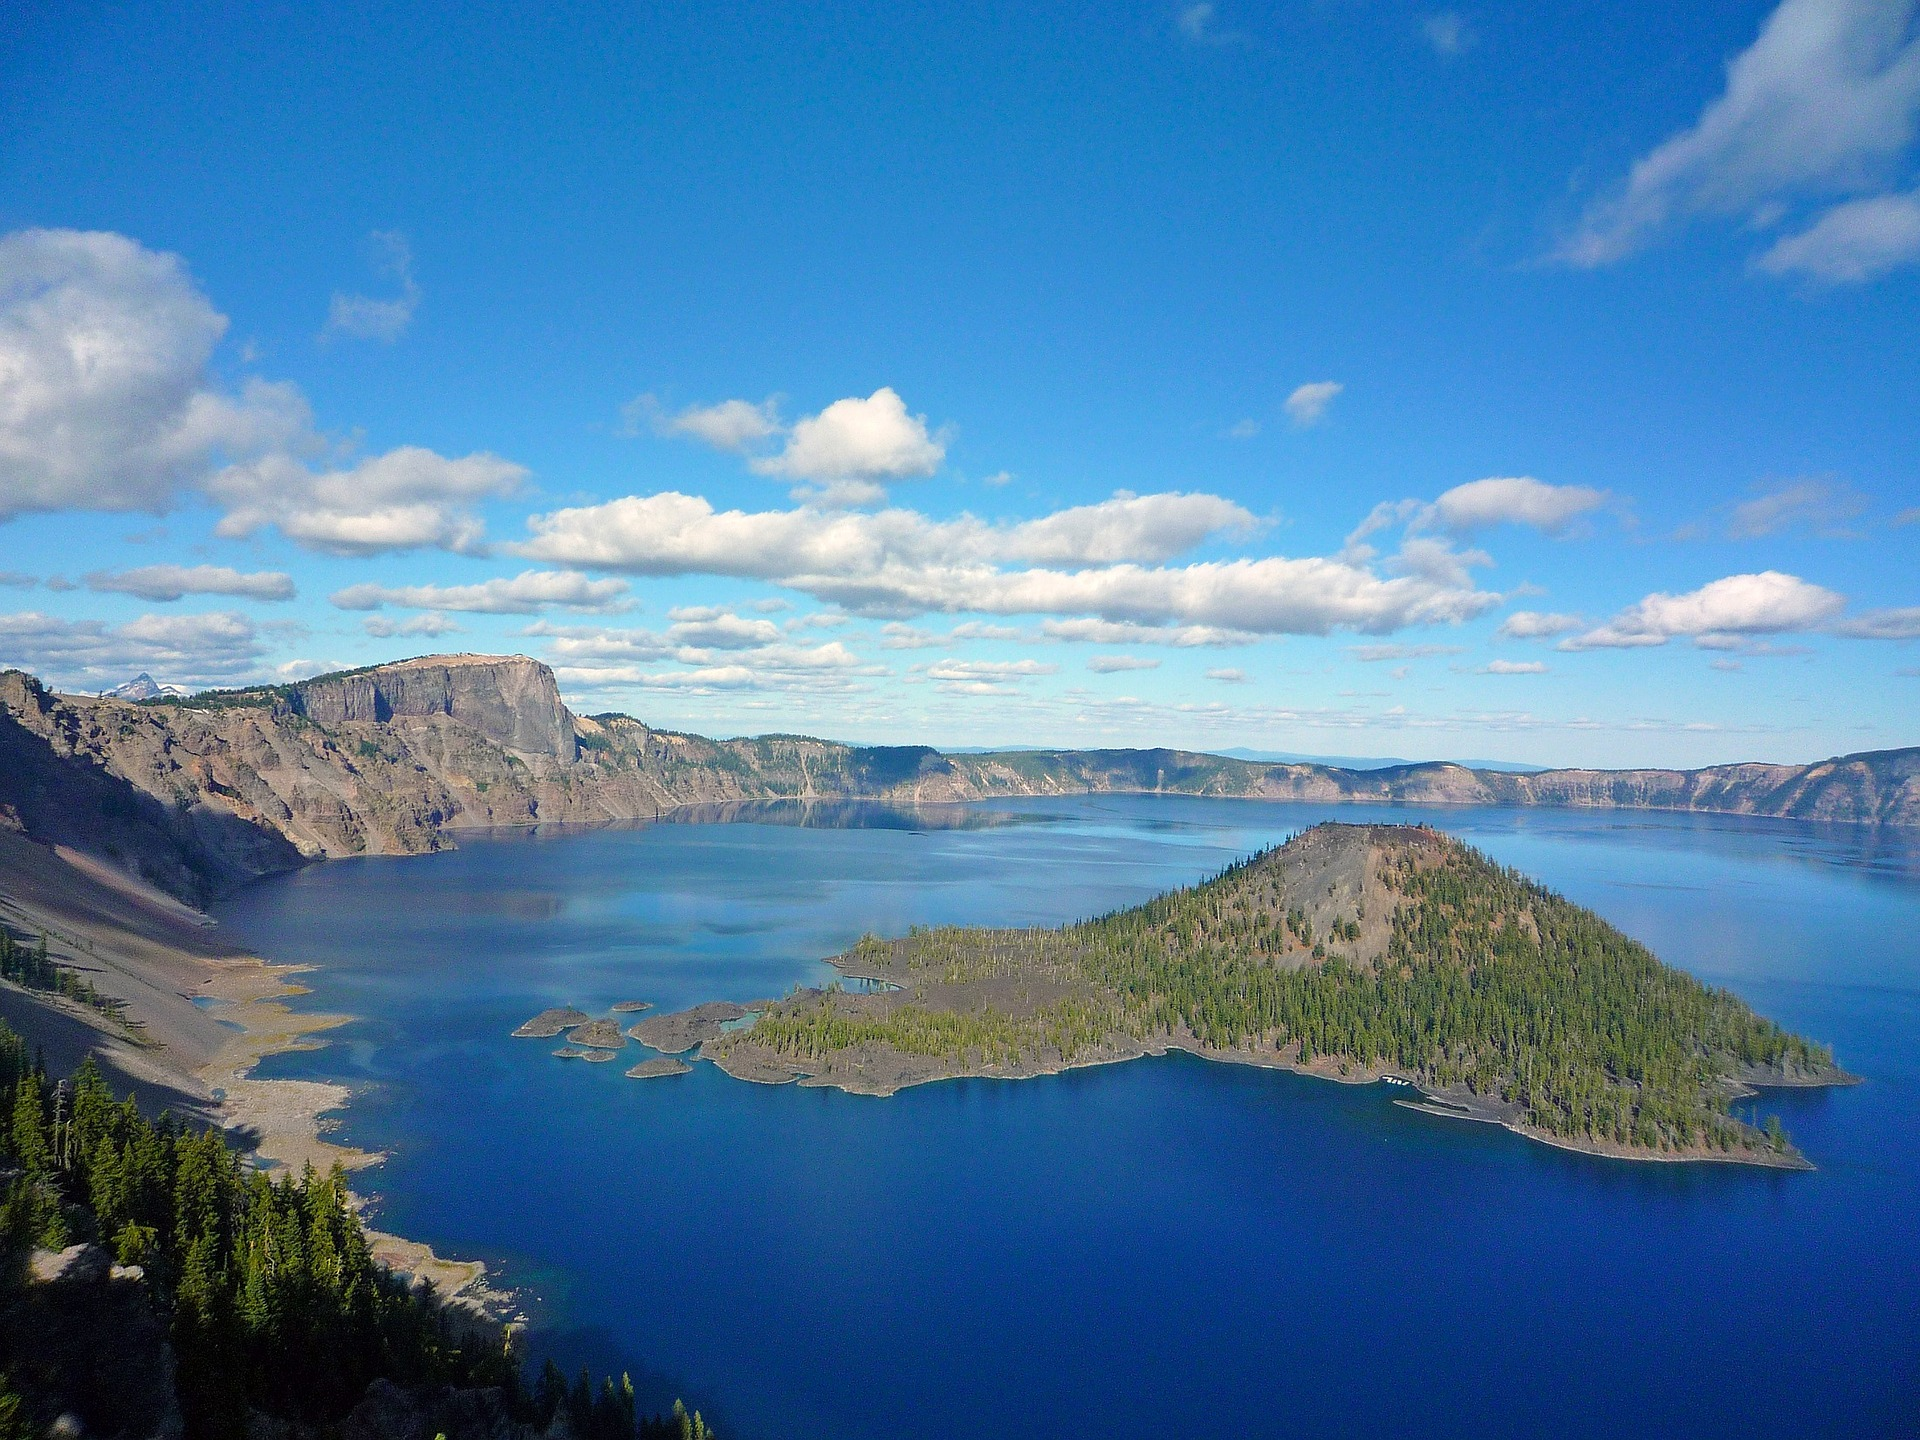 crater-lake-1669799_1920